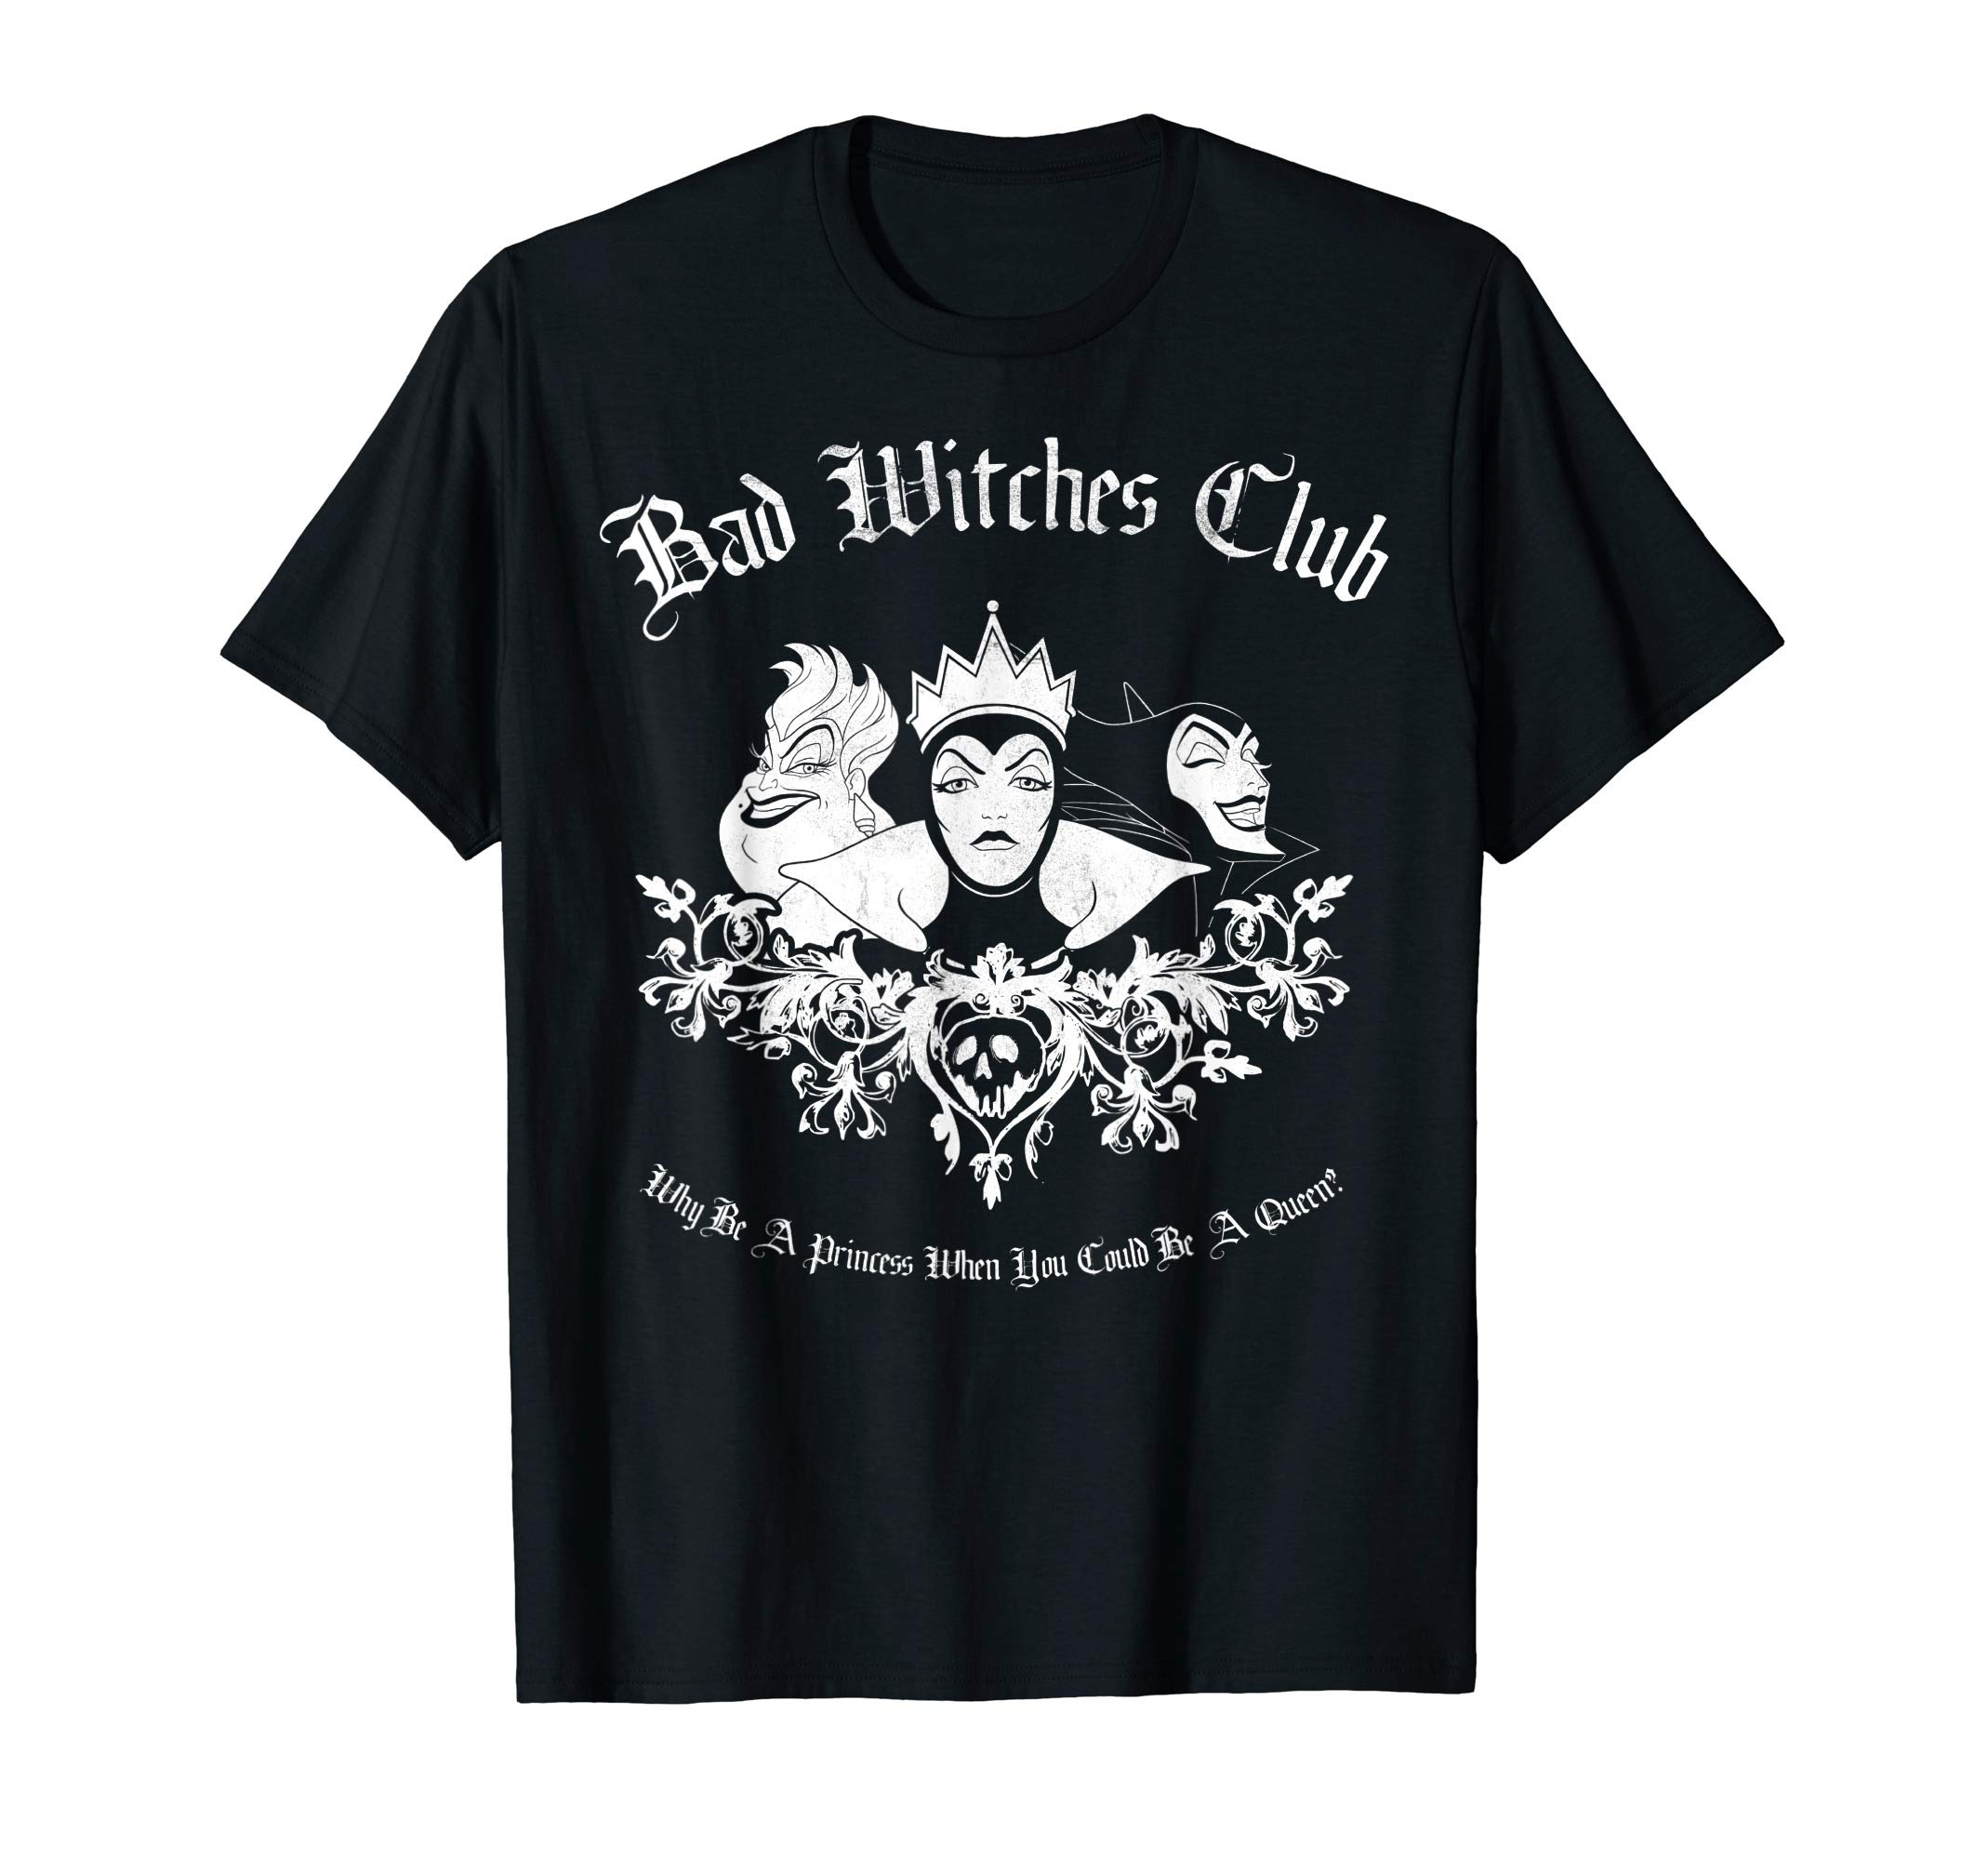 Villains Bad Witches Club Group Shot Graphic T-Shirt T-Shirt